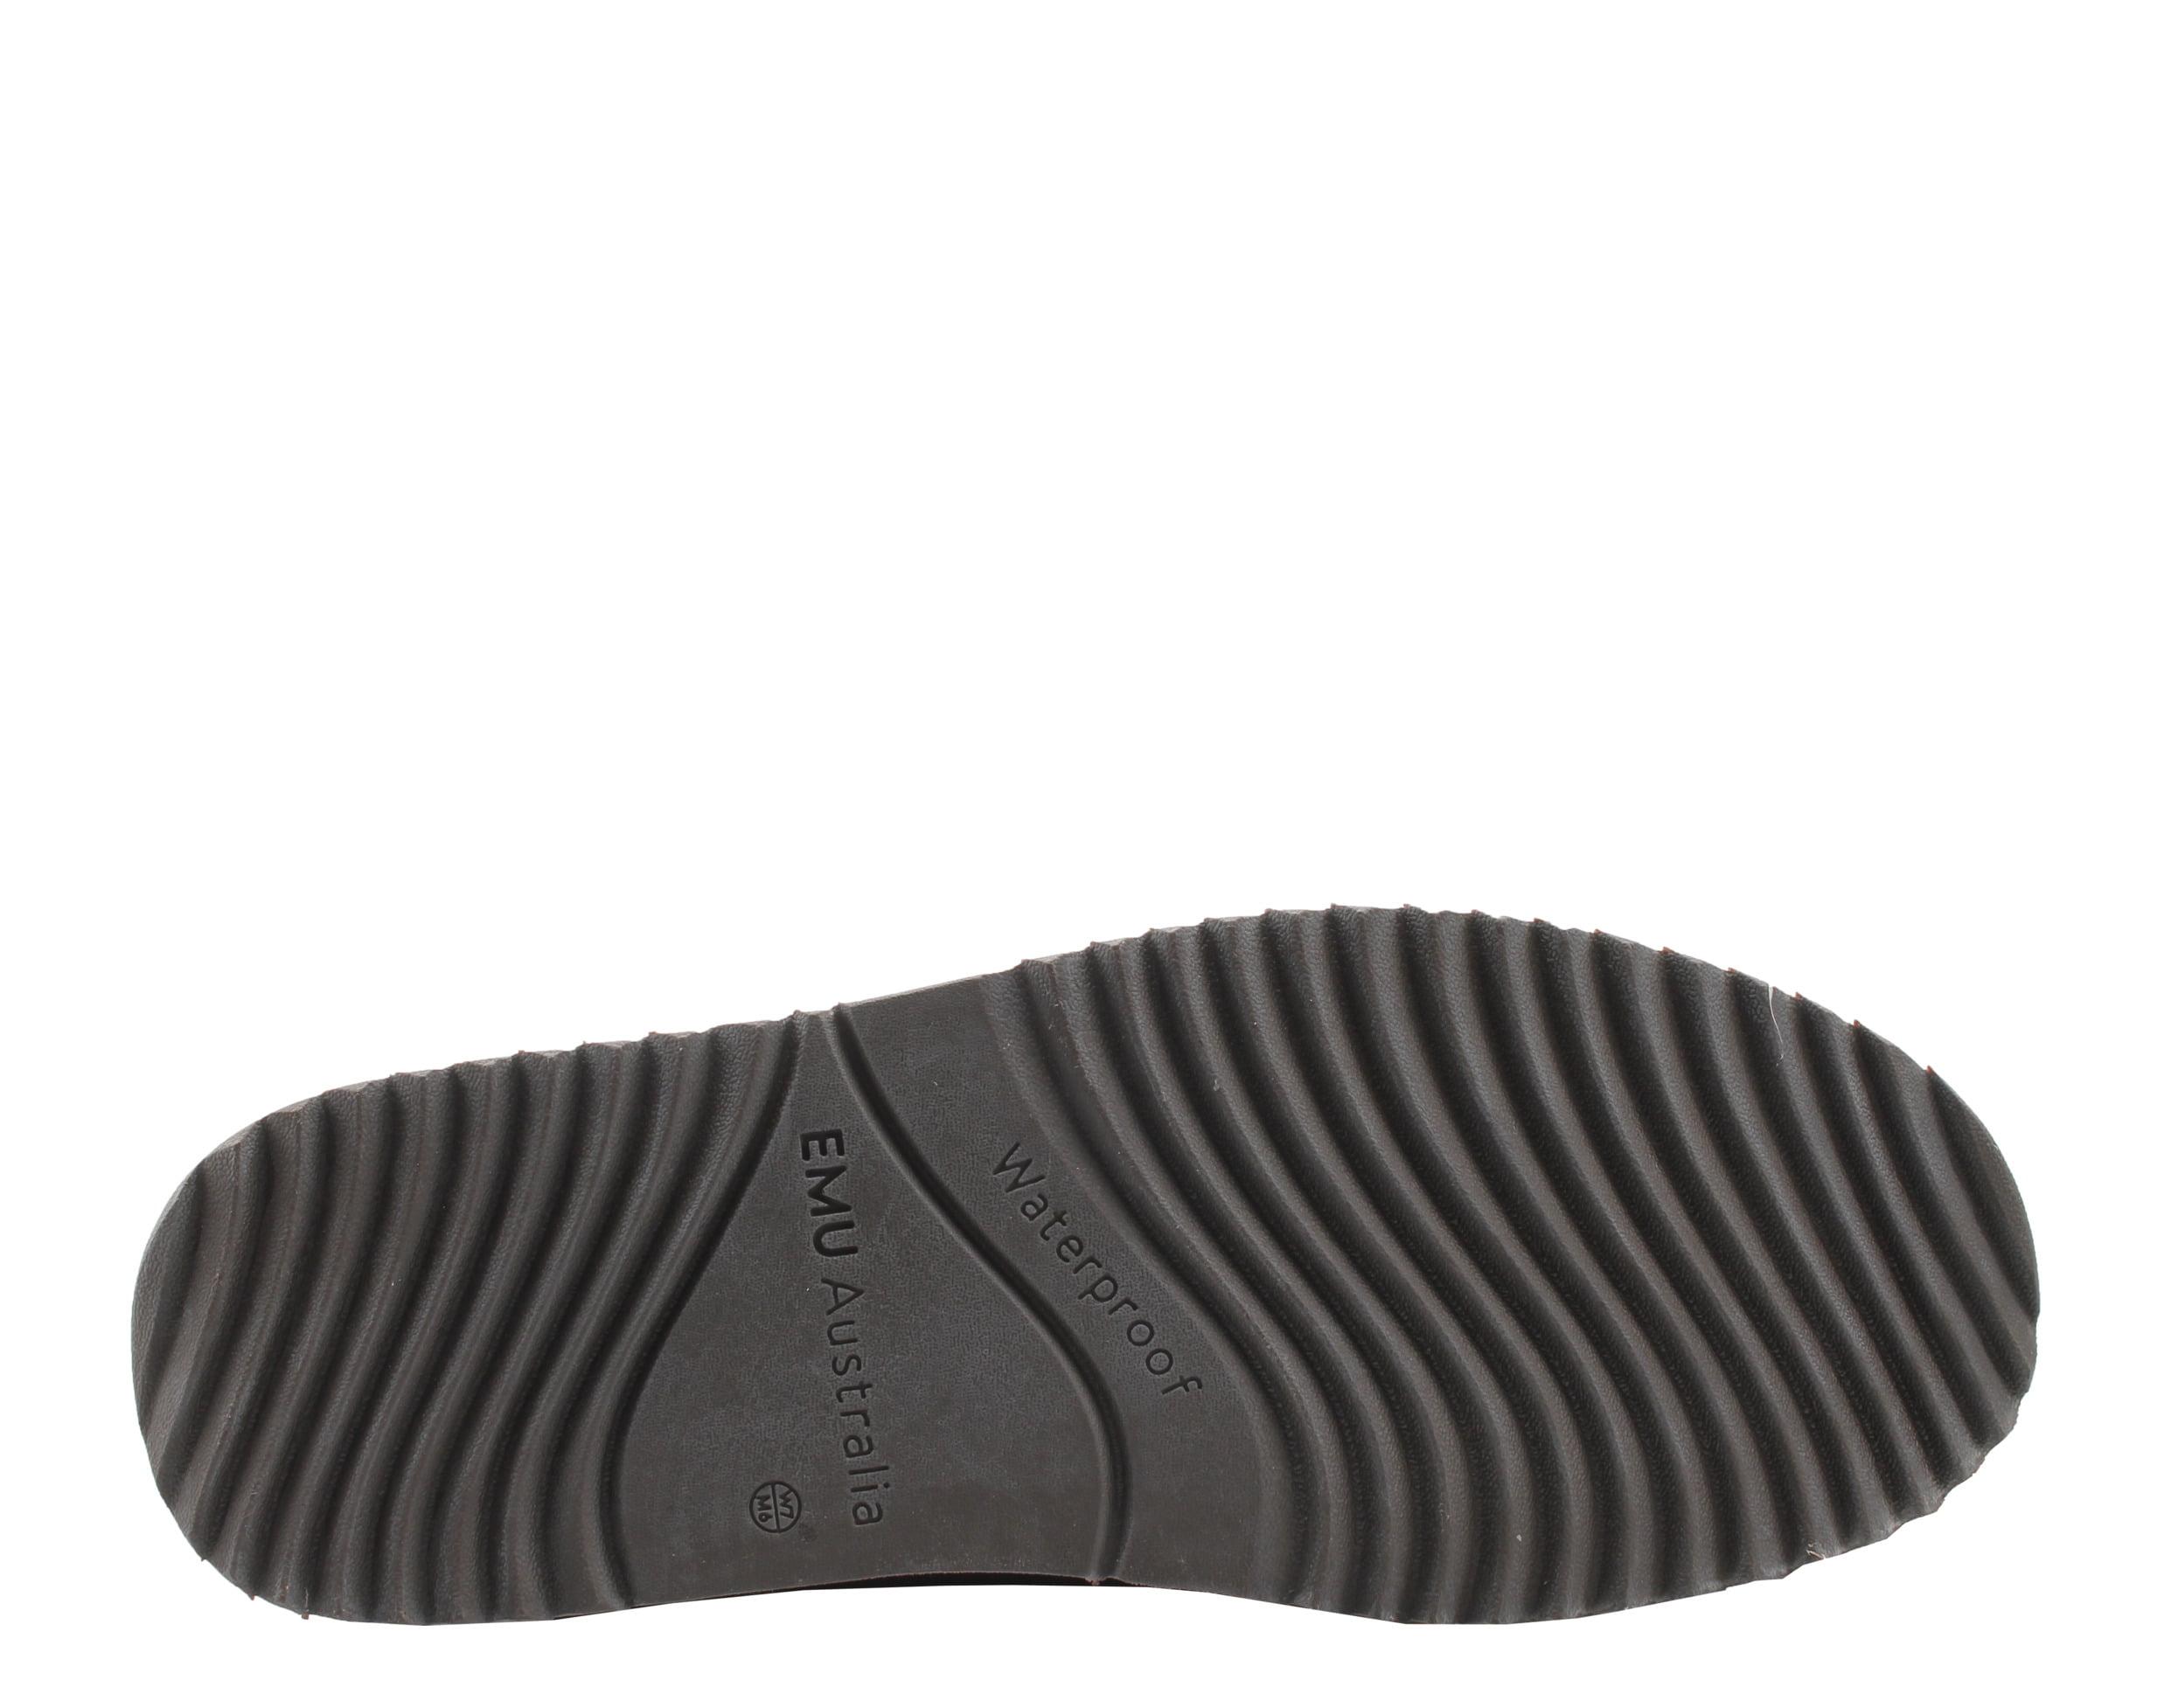 79a89b71e72 Emu Australia Paterson Lo Chocolate Waterproof Women's Boots W10771